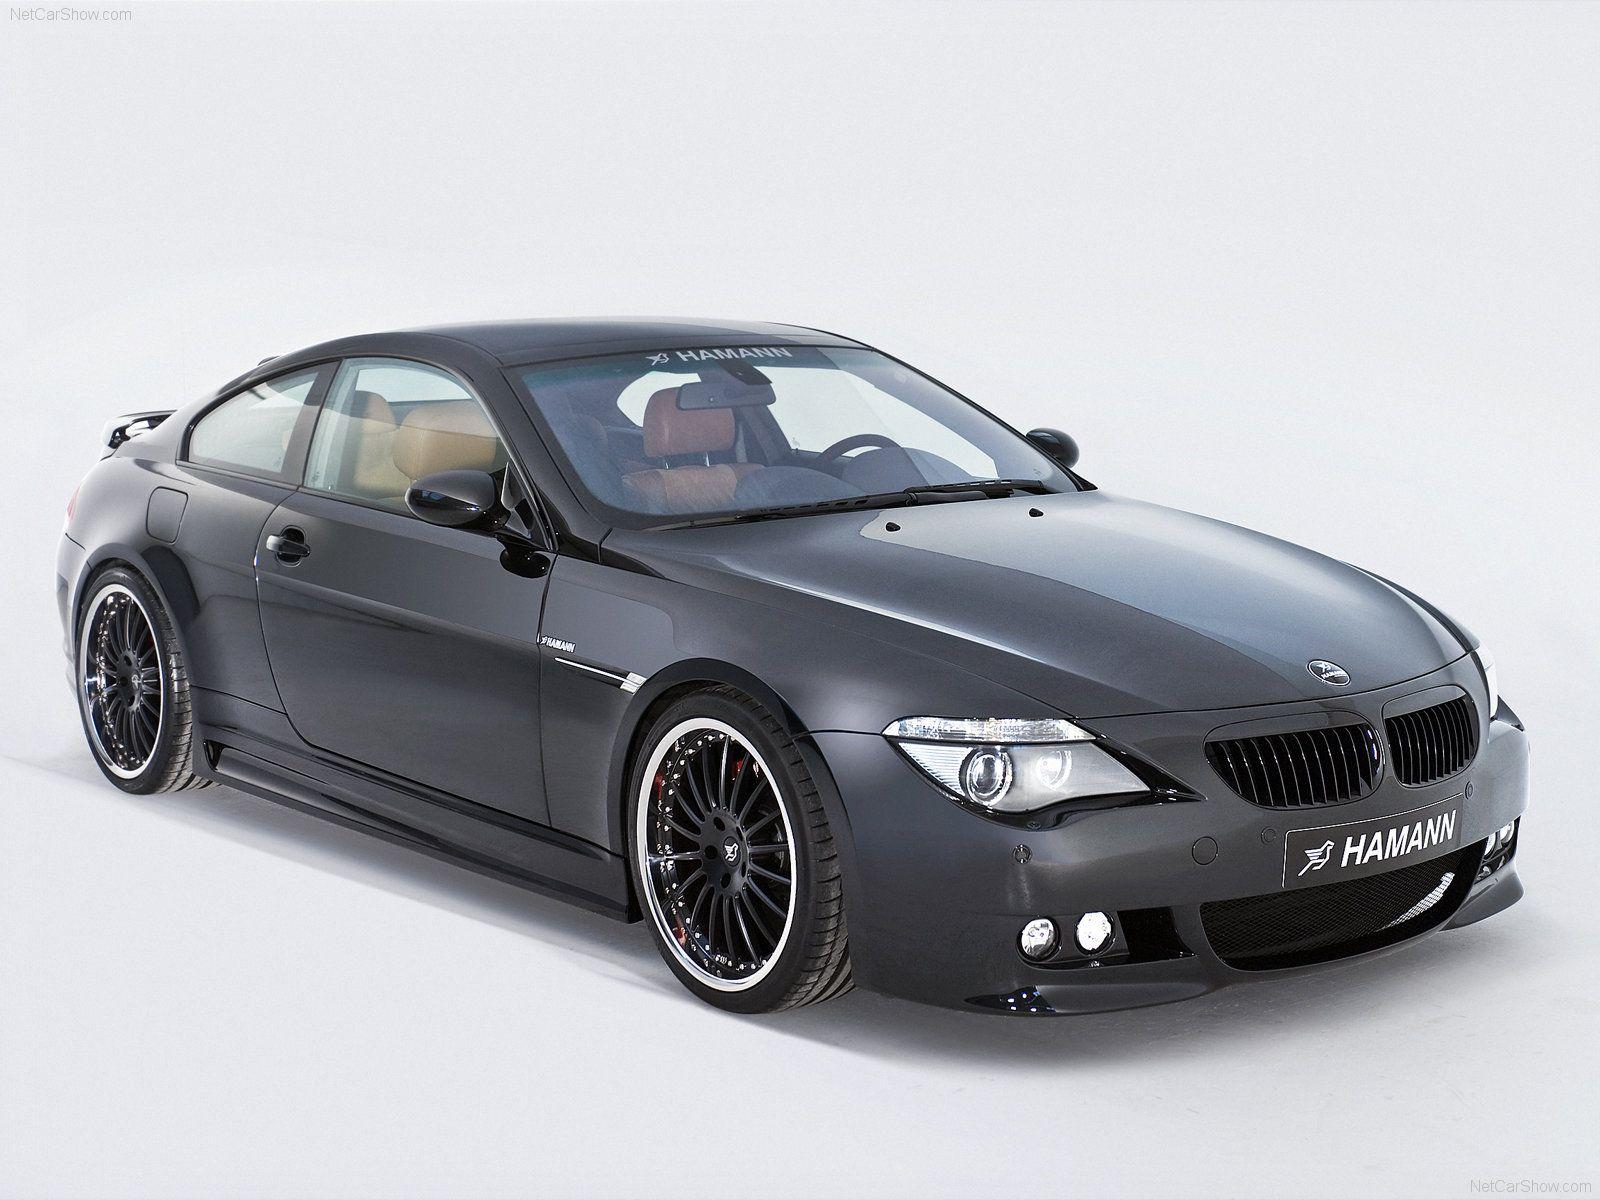 Hamann BMWX i E modified cars wallpaper x